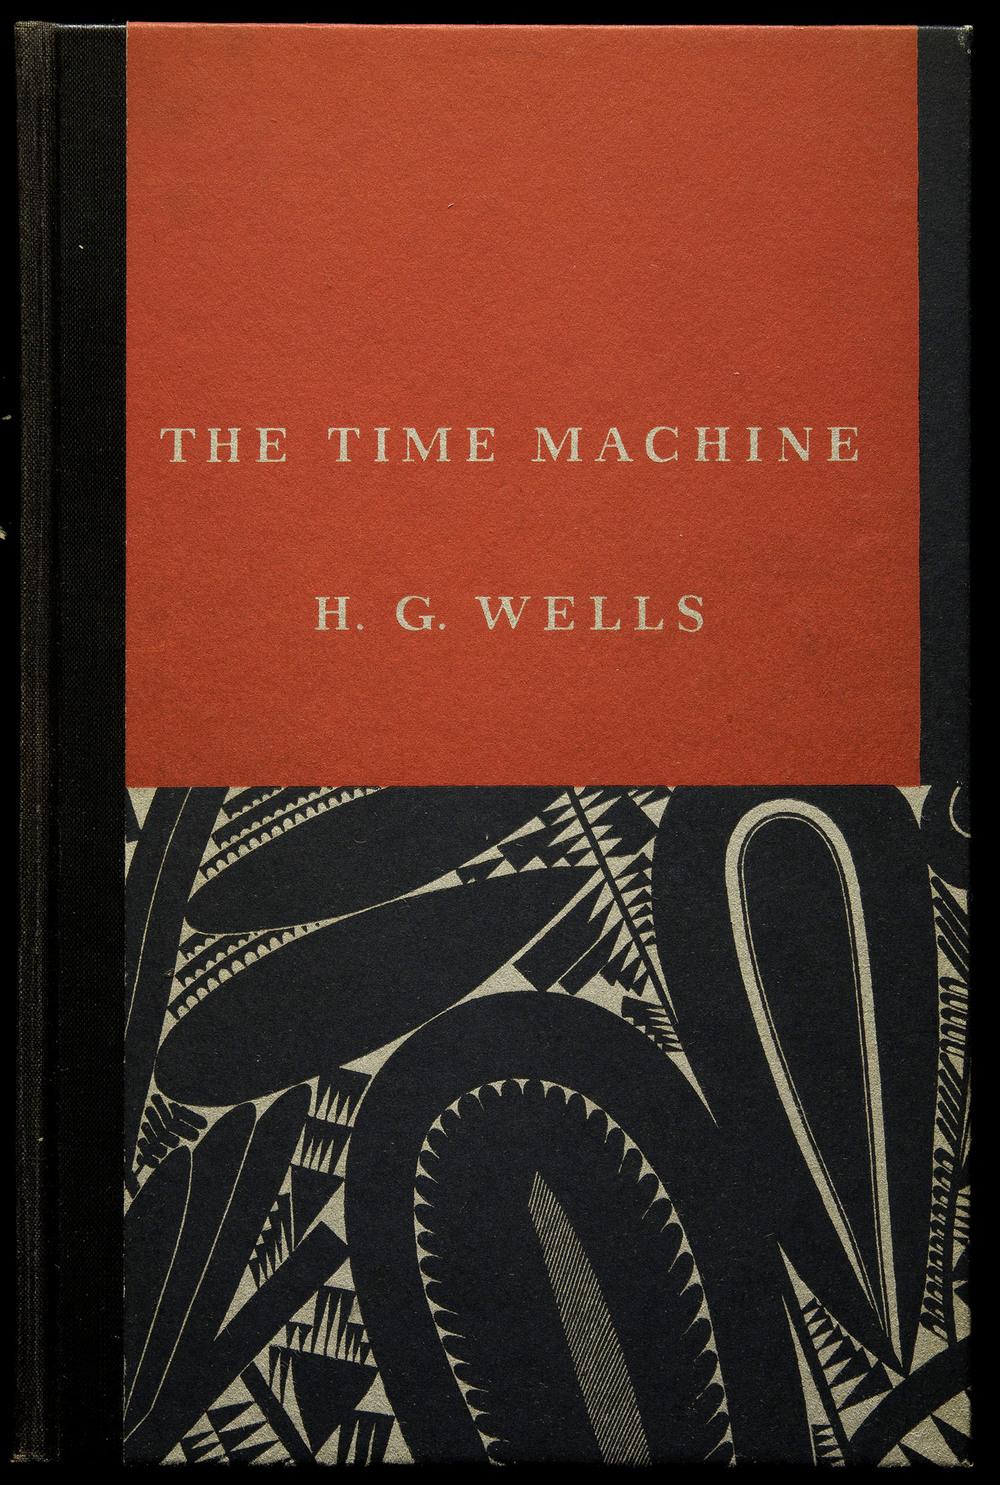 The Time Machine , Random House, New York, 1931, 15.6 x 23.5 cm